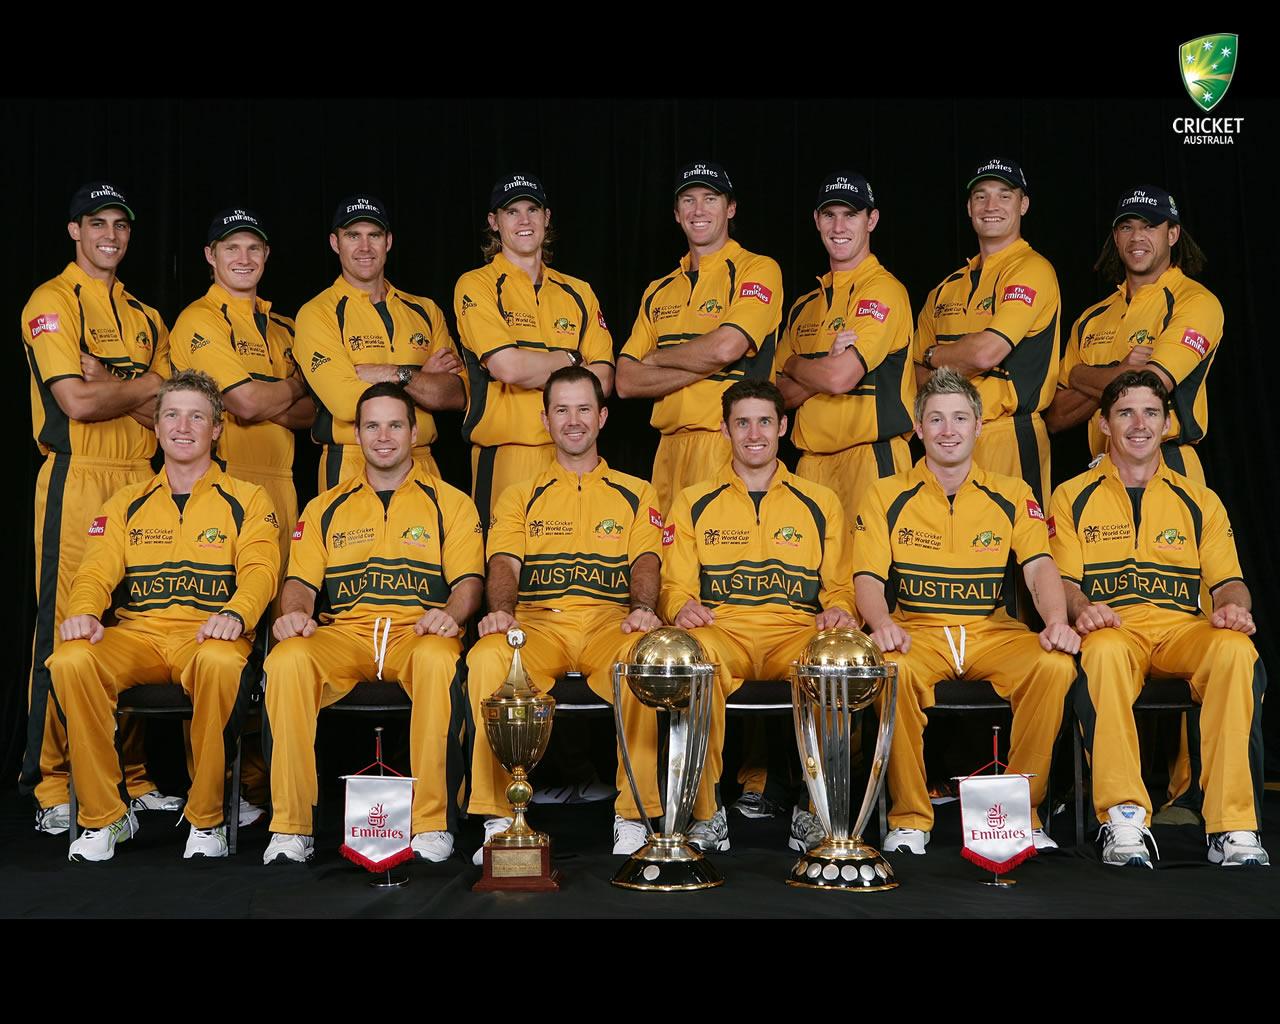 Australia Cricket Team Group Photo